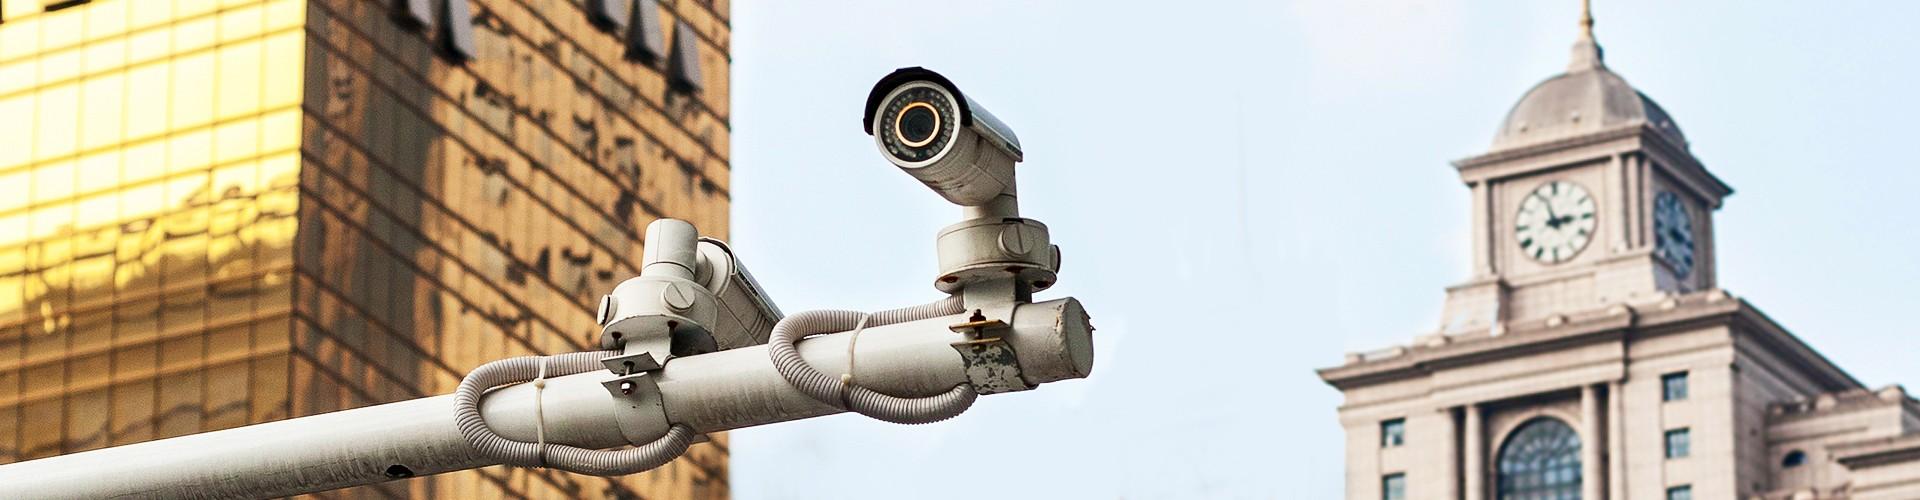 Sistemi di videosorveglianza Setik